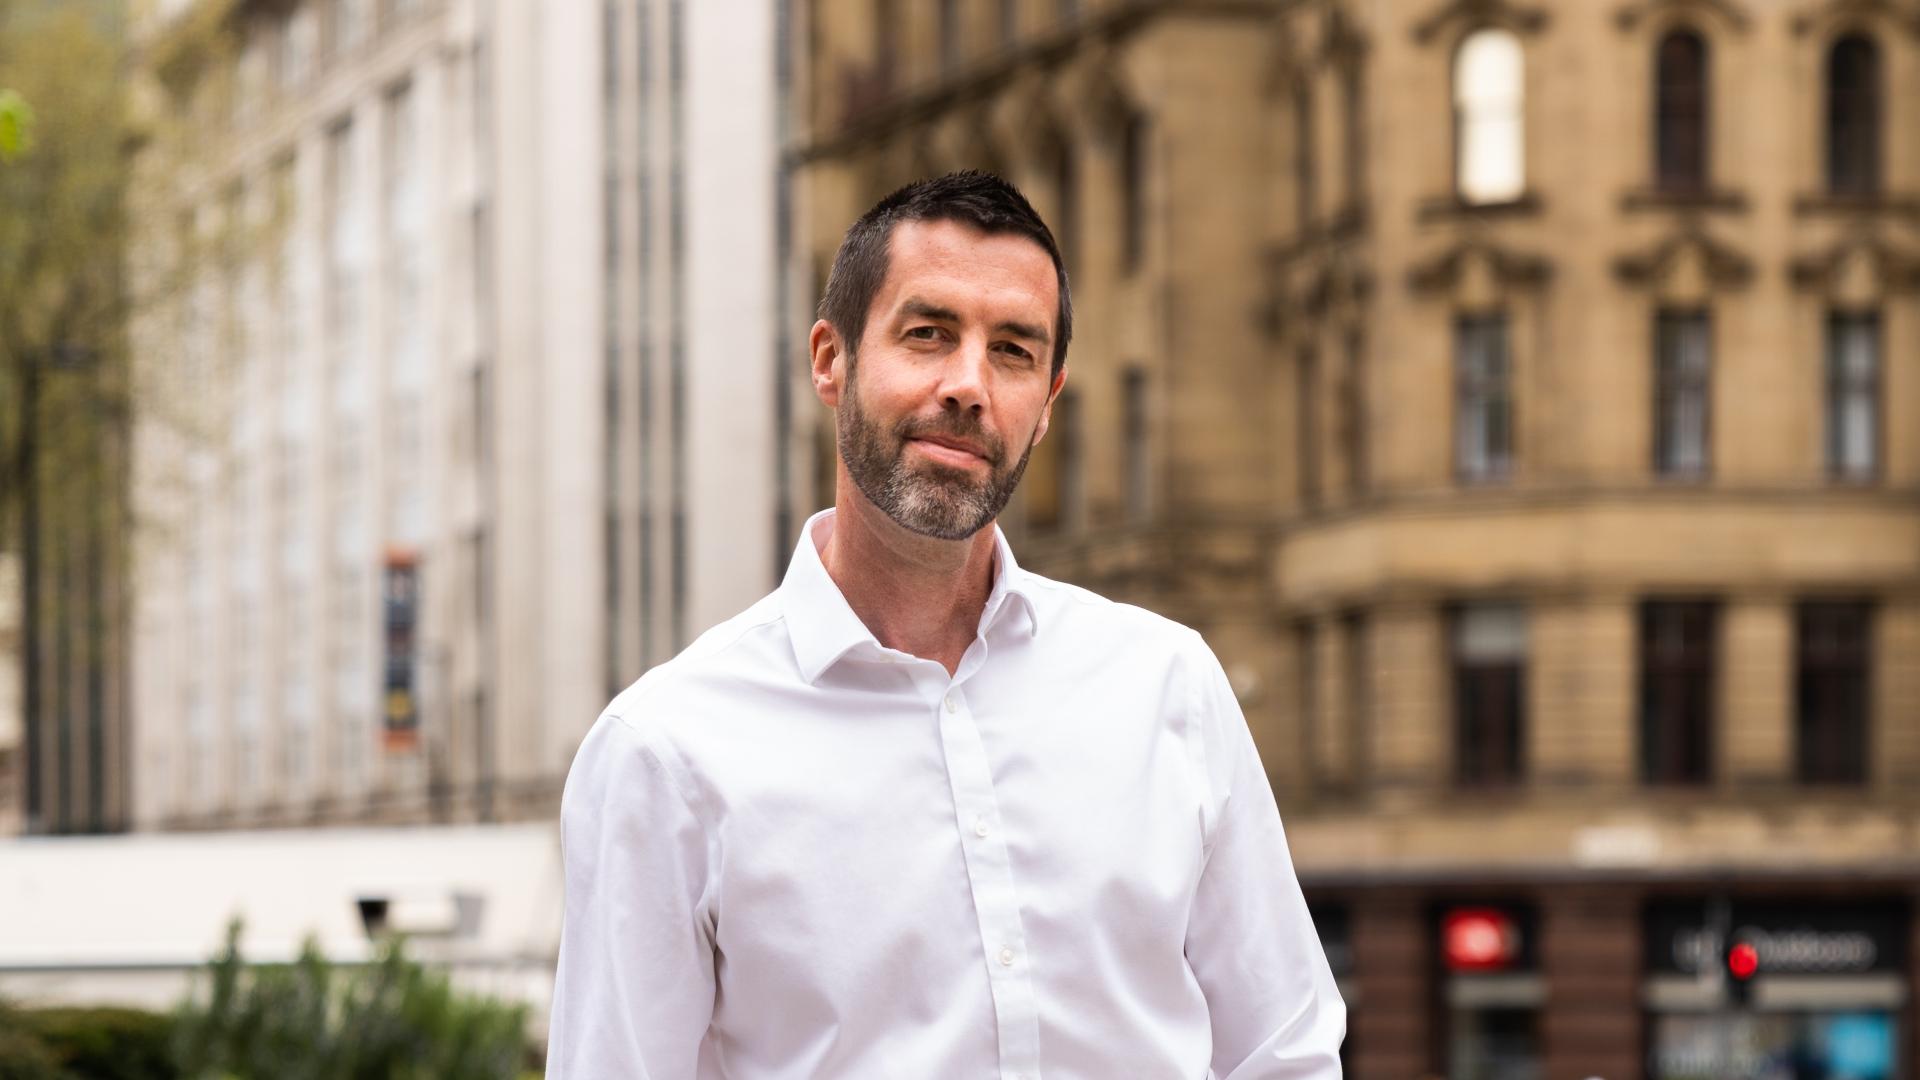 Simon Brownbill of HURST Accountants